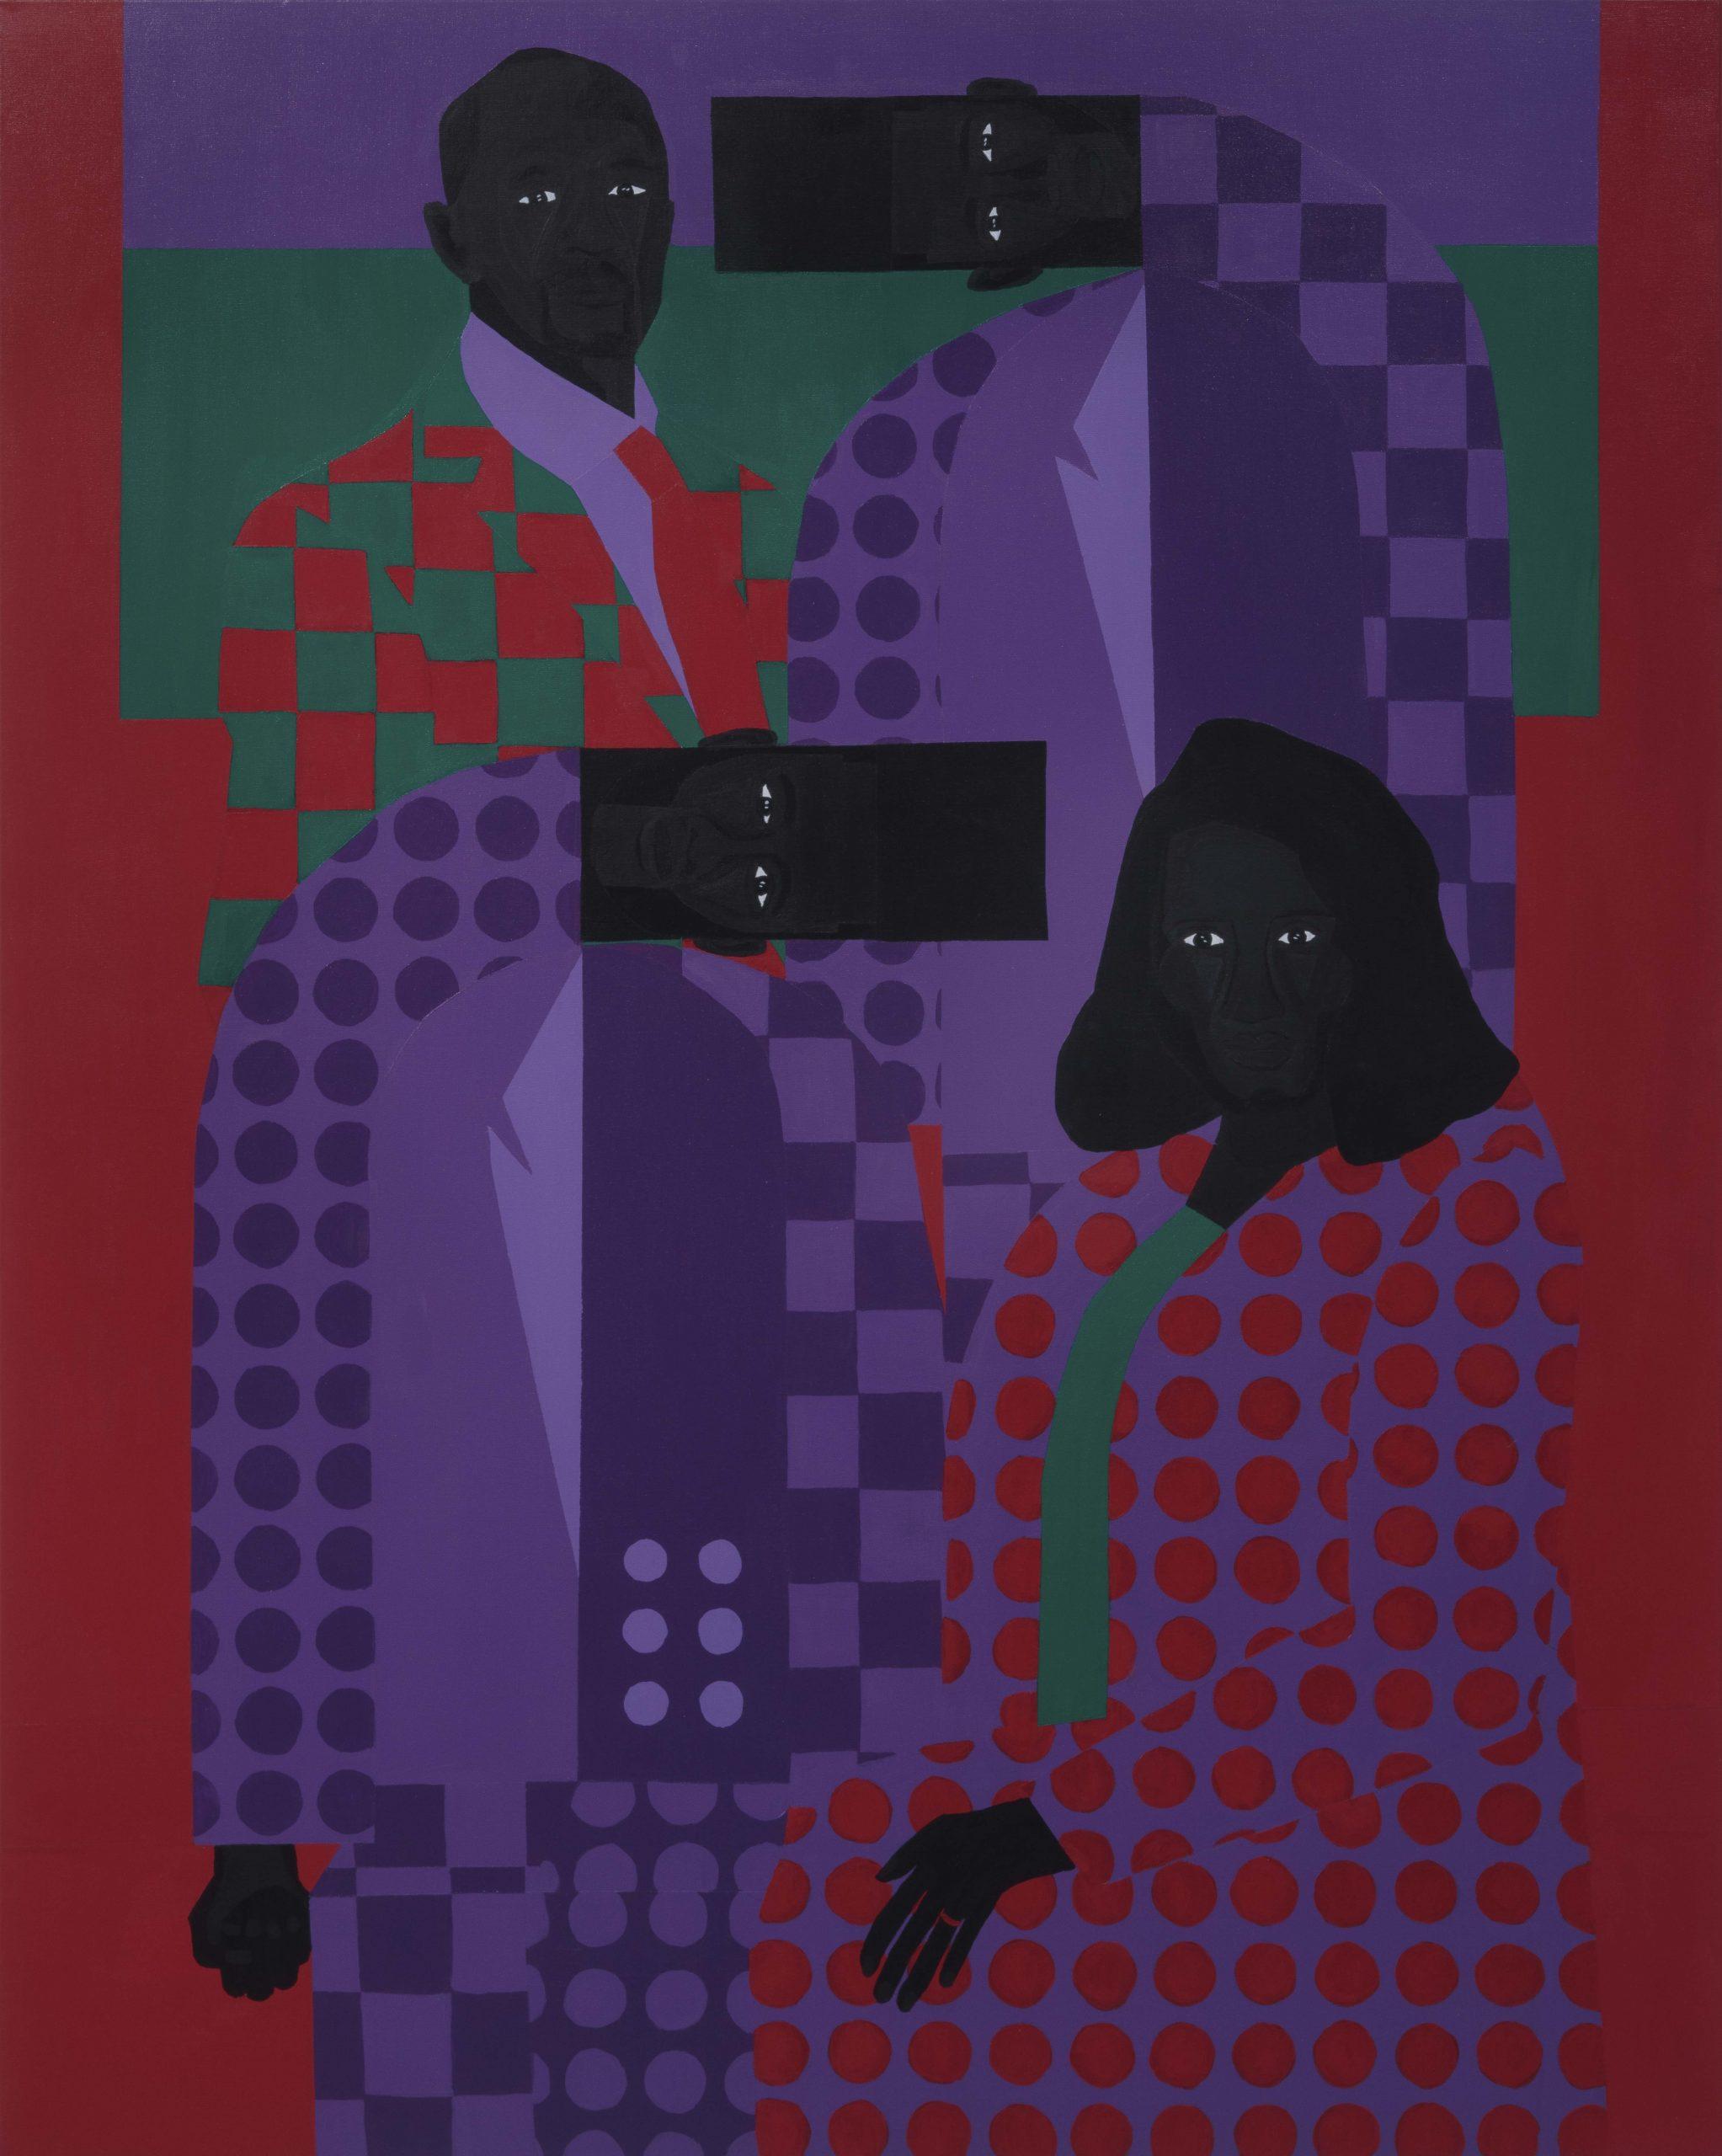 Jon Key. <em>Family Portrait No. 6 (The Key Family)</em>, 2020. Acrylic on canvas, 60 x 48 inches (152.4 x 121.9 cm)